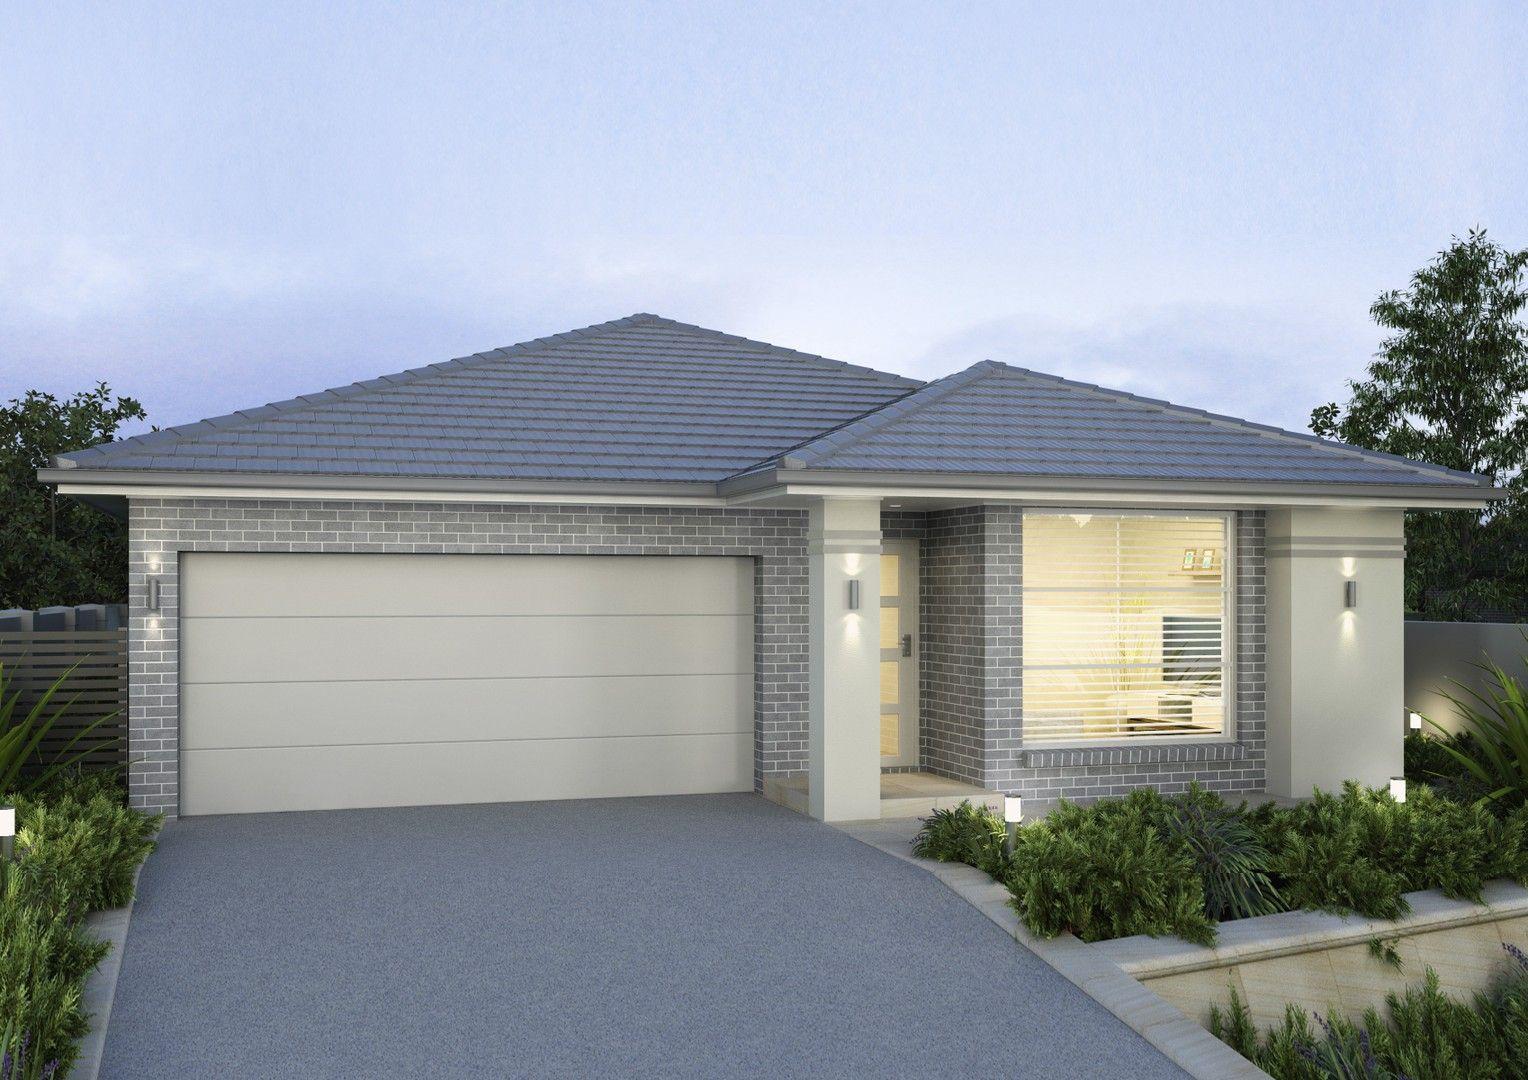 Lot 5205 Gamble Street, Campbelltown NSW 2560, Image 0